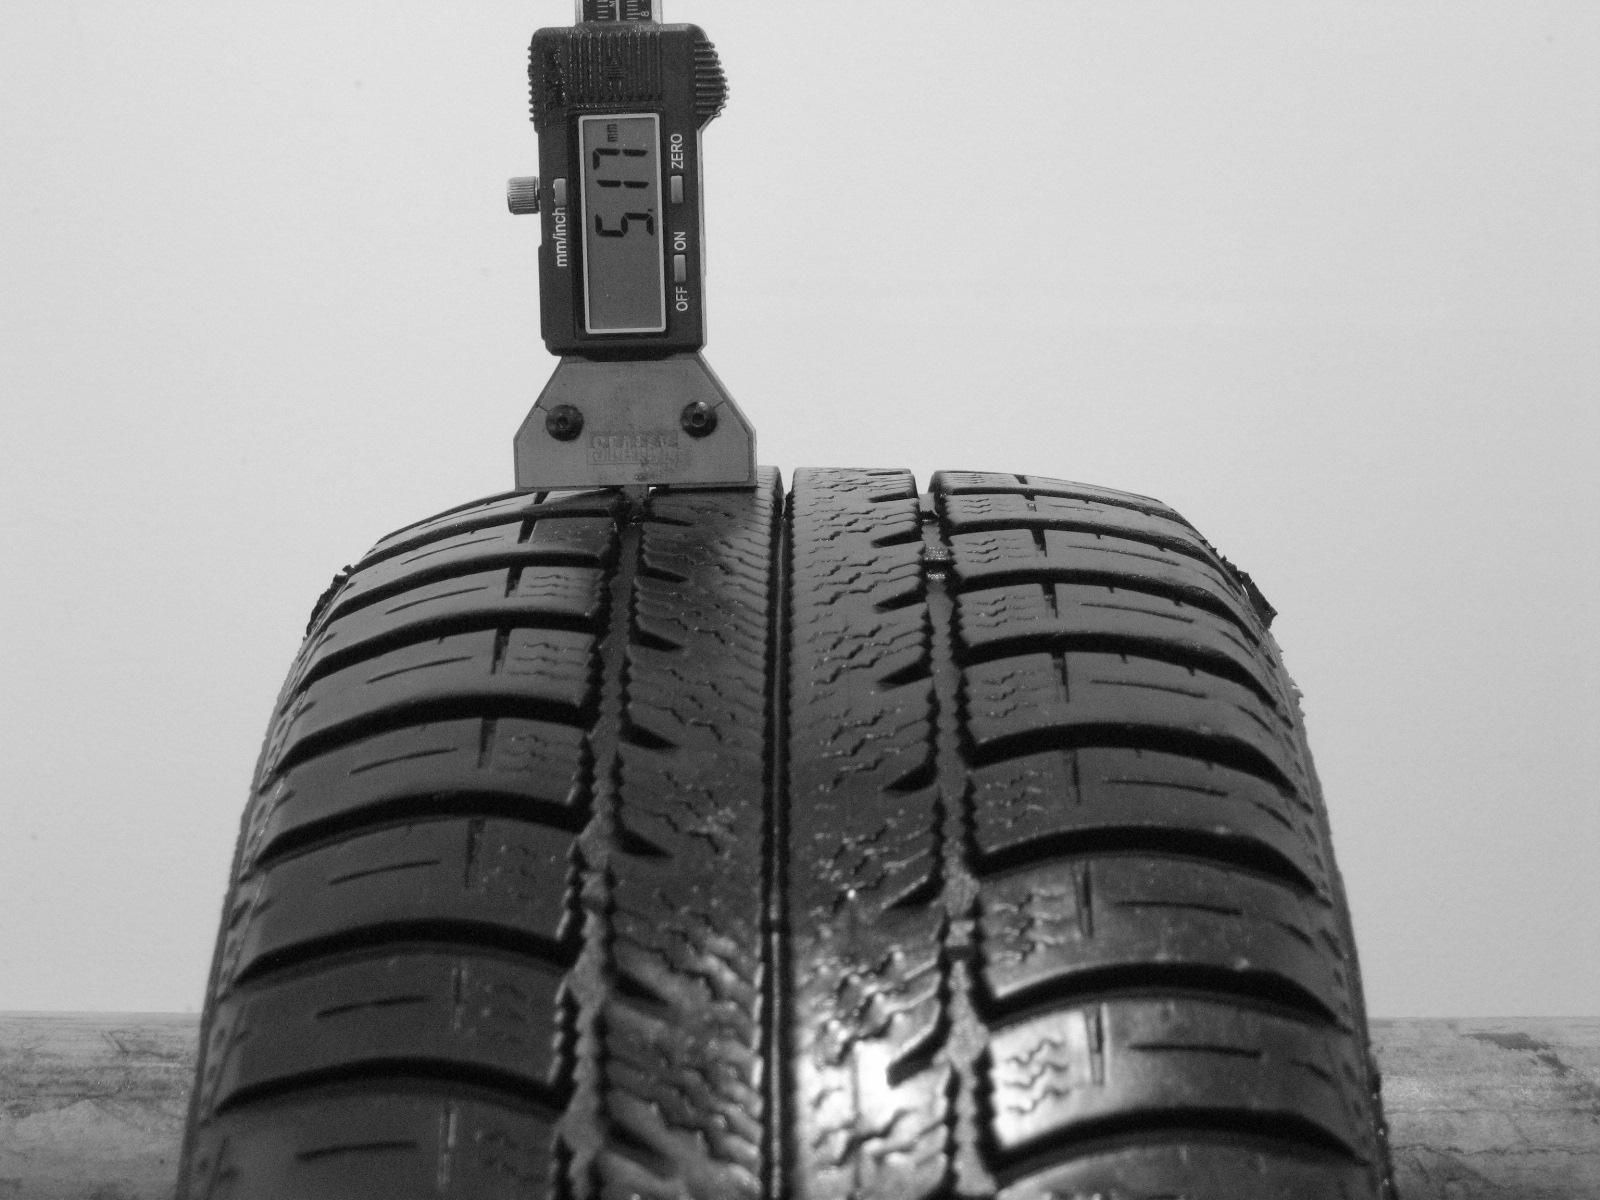 Použité-Pneu-Bazar - 185/60 R14 GOODYEAR EAGLE VECTOR -kusovka-rezerva 3mm